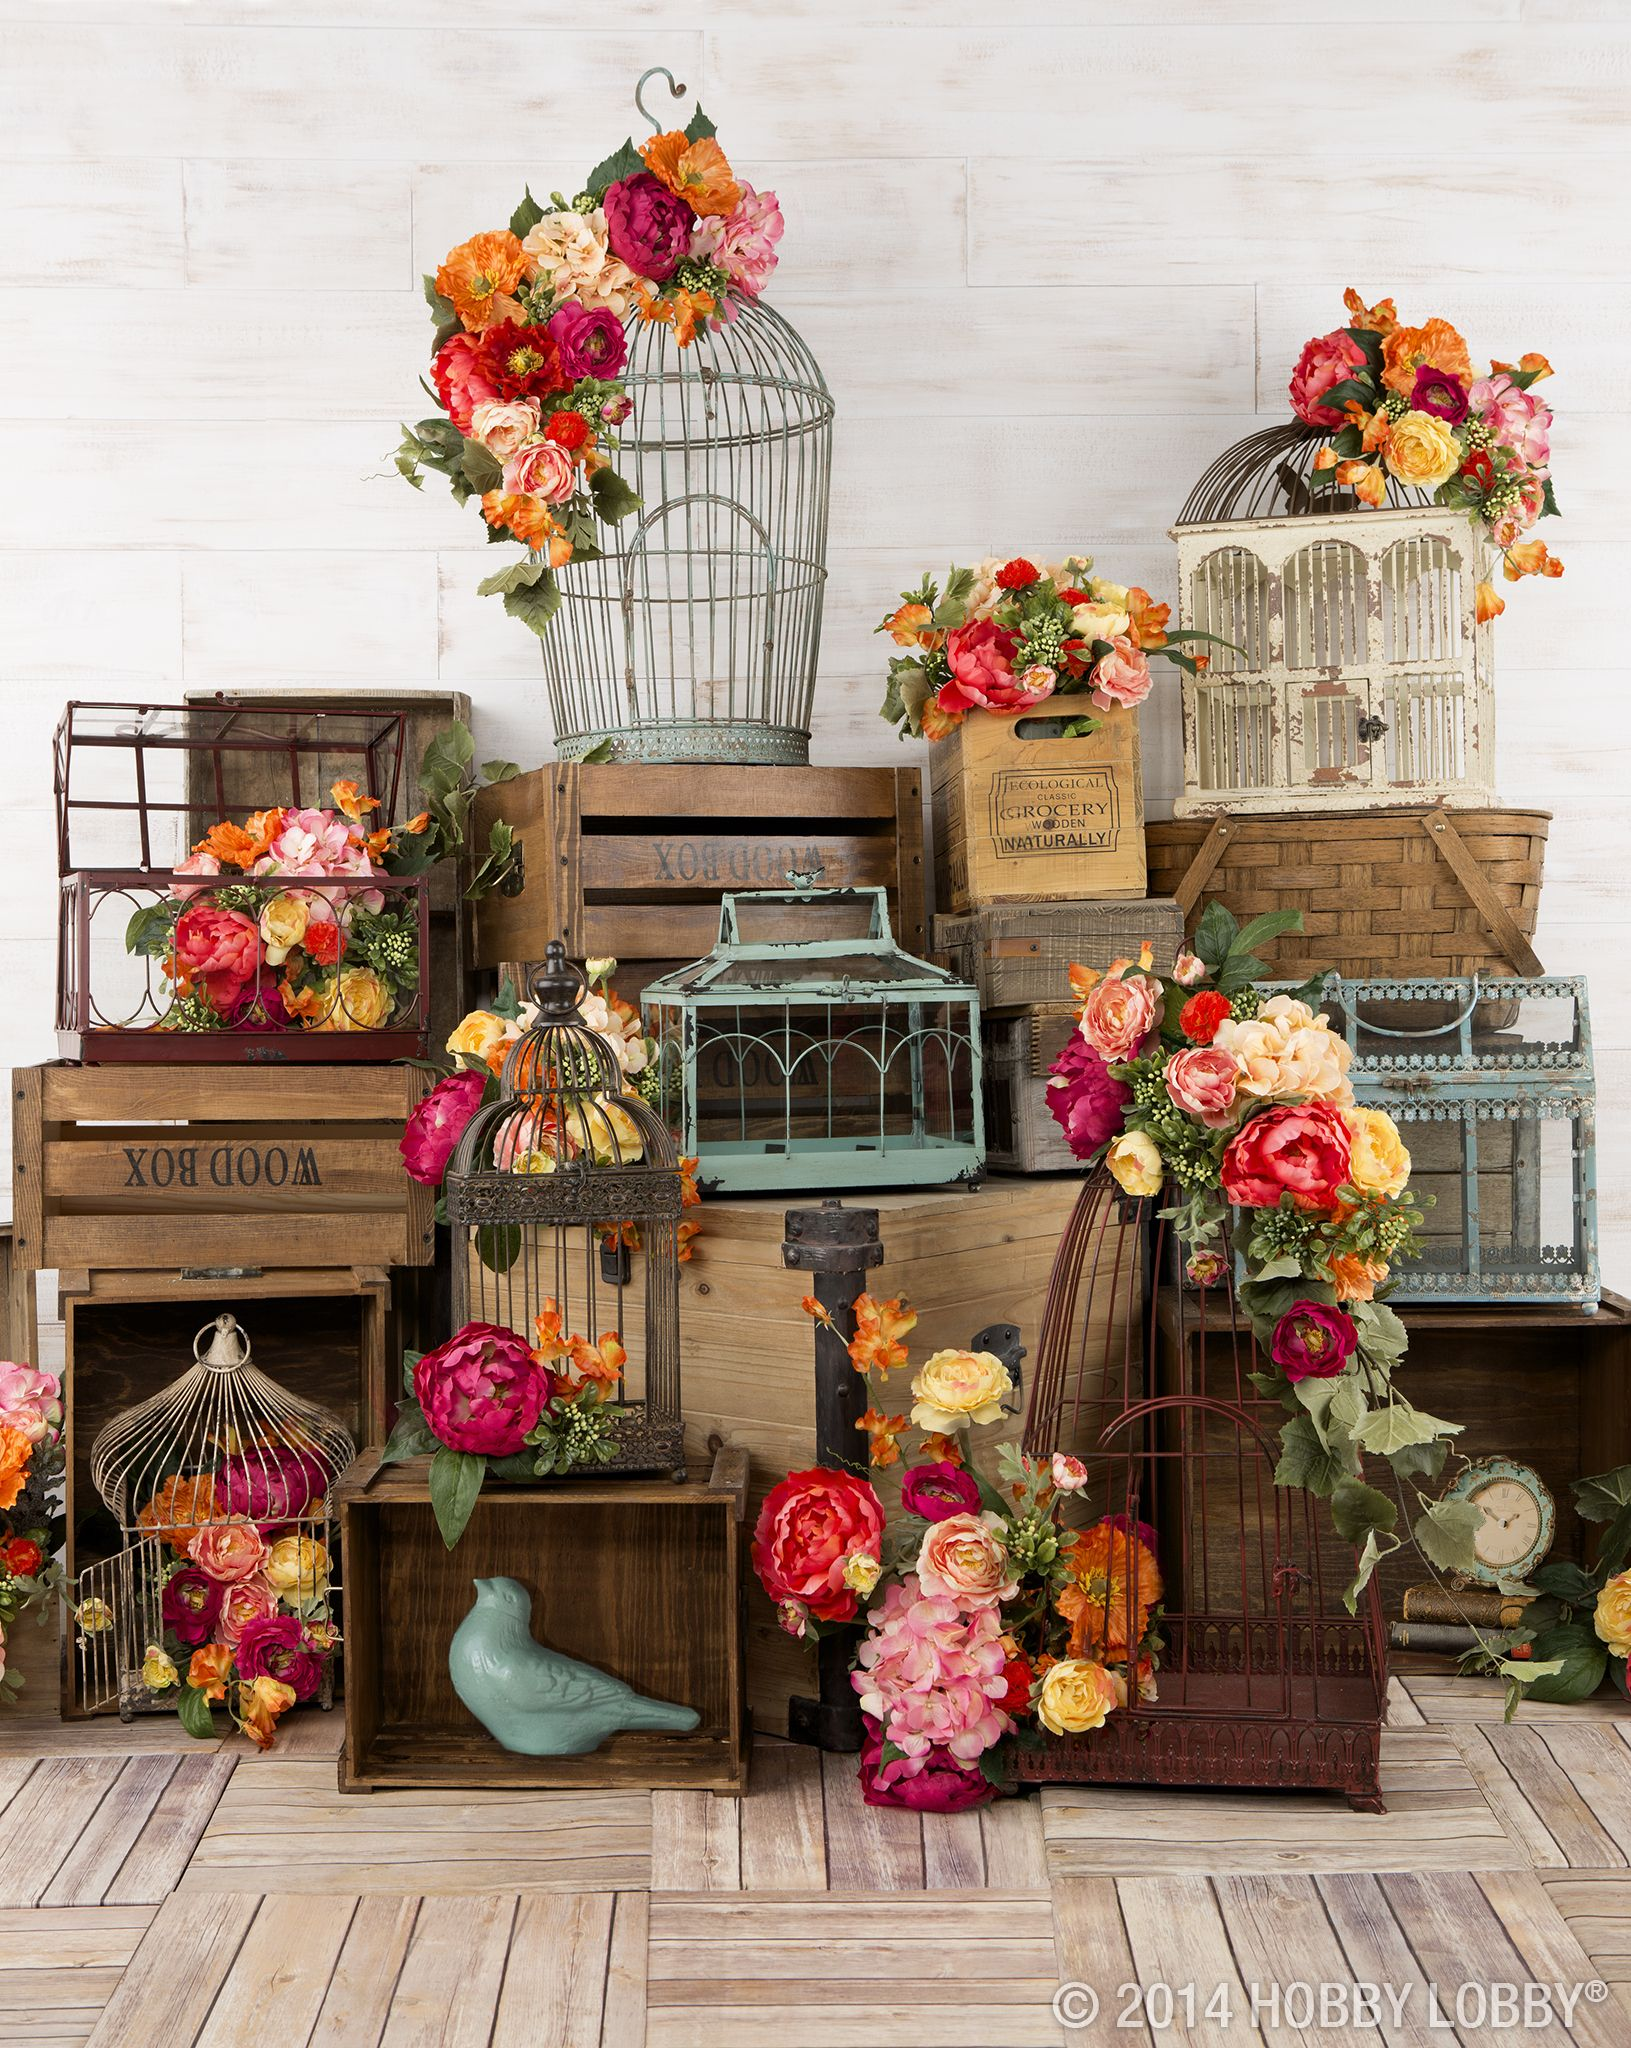 Hobby lobby garden decor  Cover a birdcage with big blooms for lovely springtime decor  For